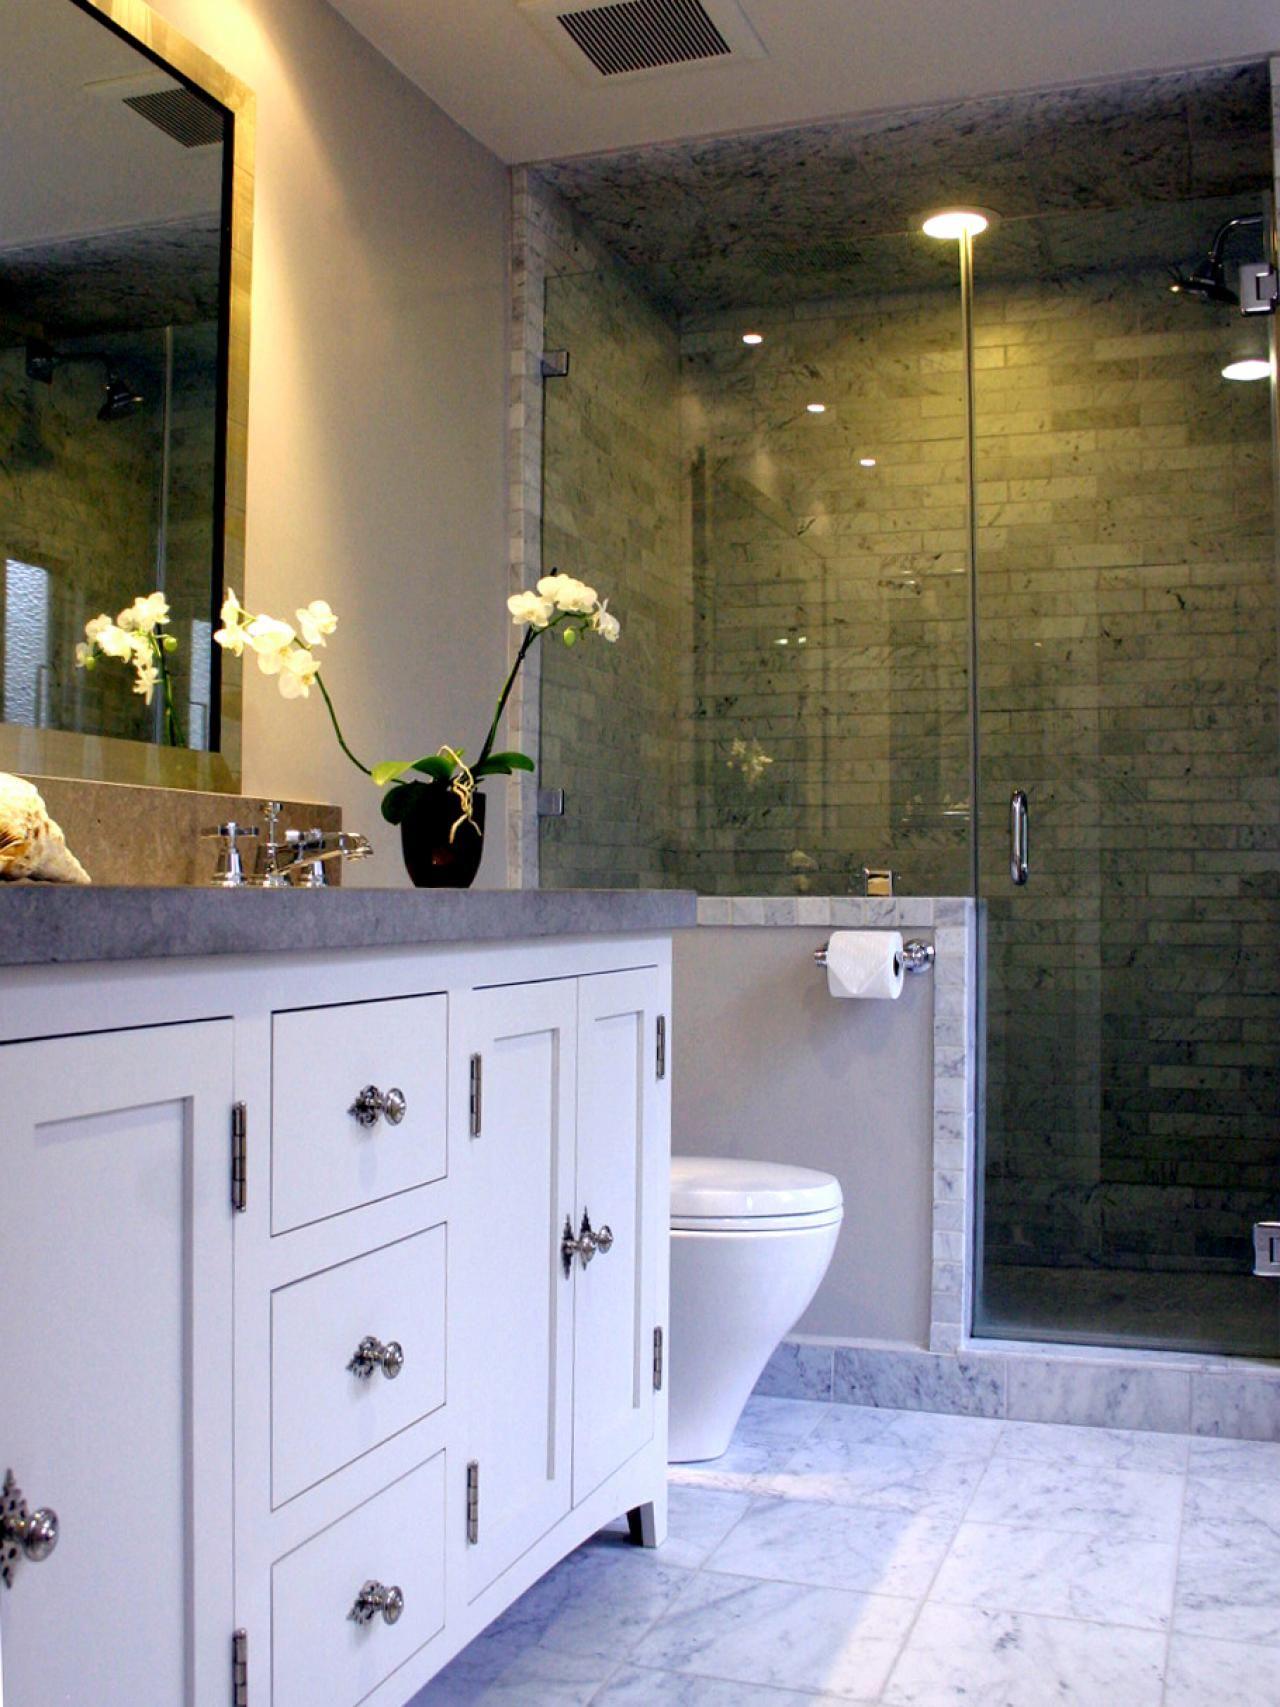 Neutral Transitional Bathroom With Gray Tile Walk In Shower Transitional Bathroom Design Bathrooms Remodel Bathroom Design